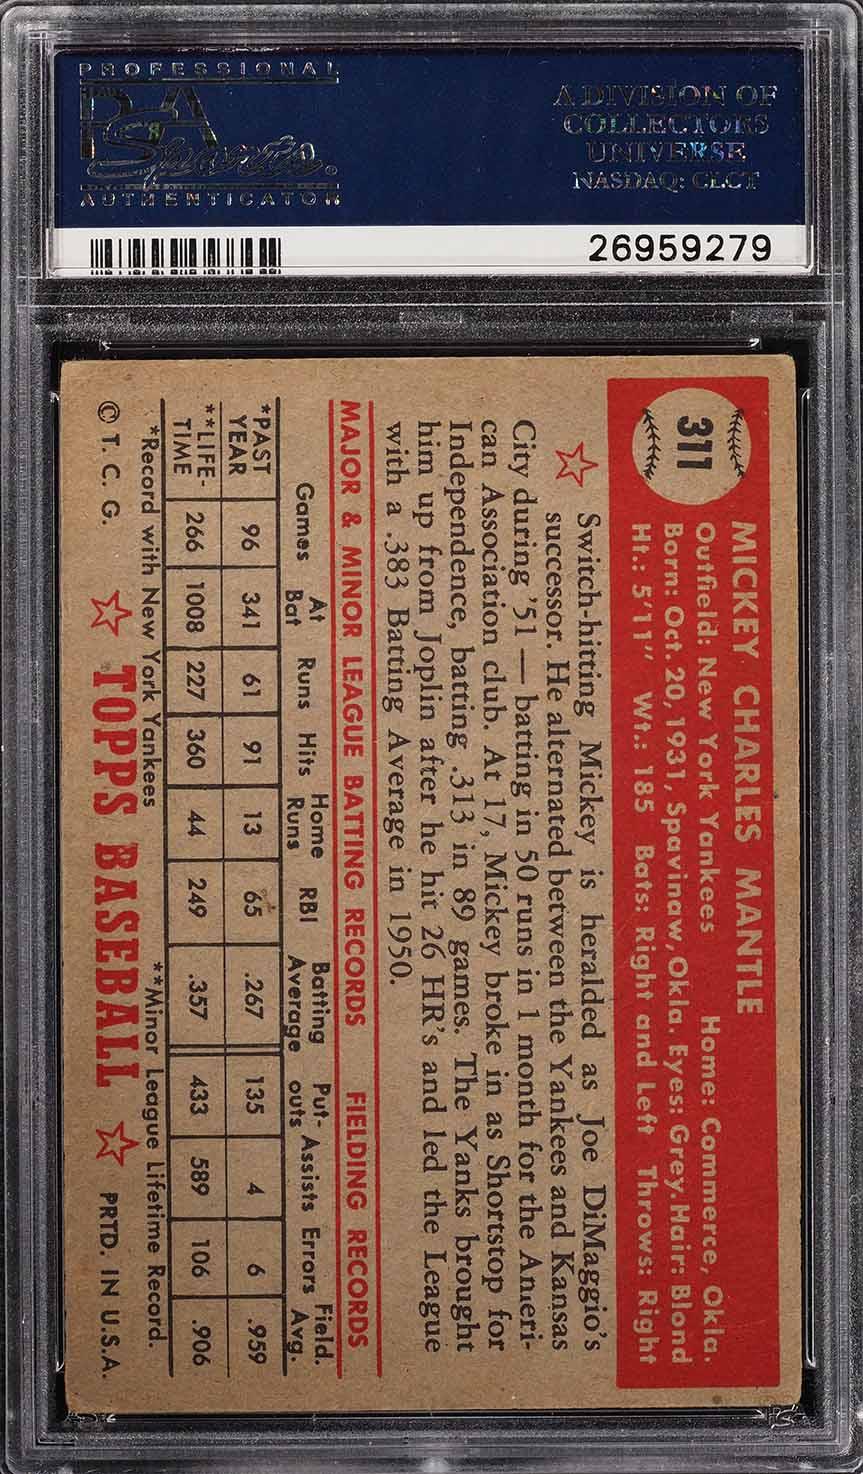 1952 Topps Mickey Mantle #311 PSA 3.5 VG+ (PWCC) - Image 2